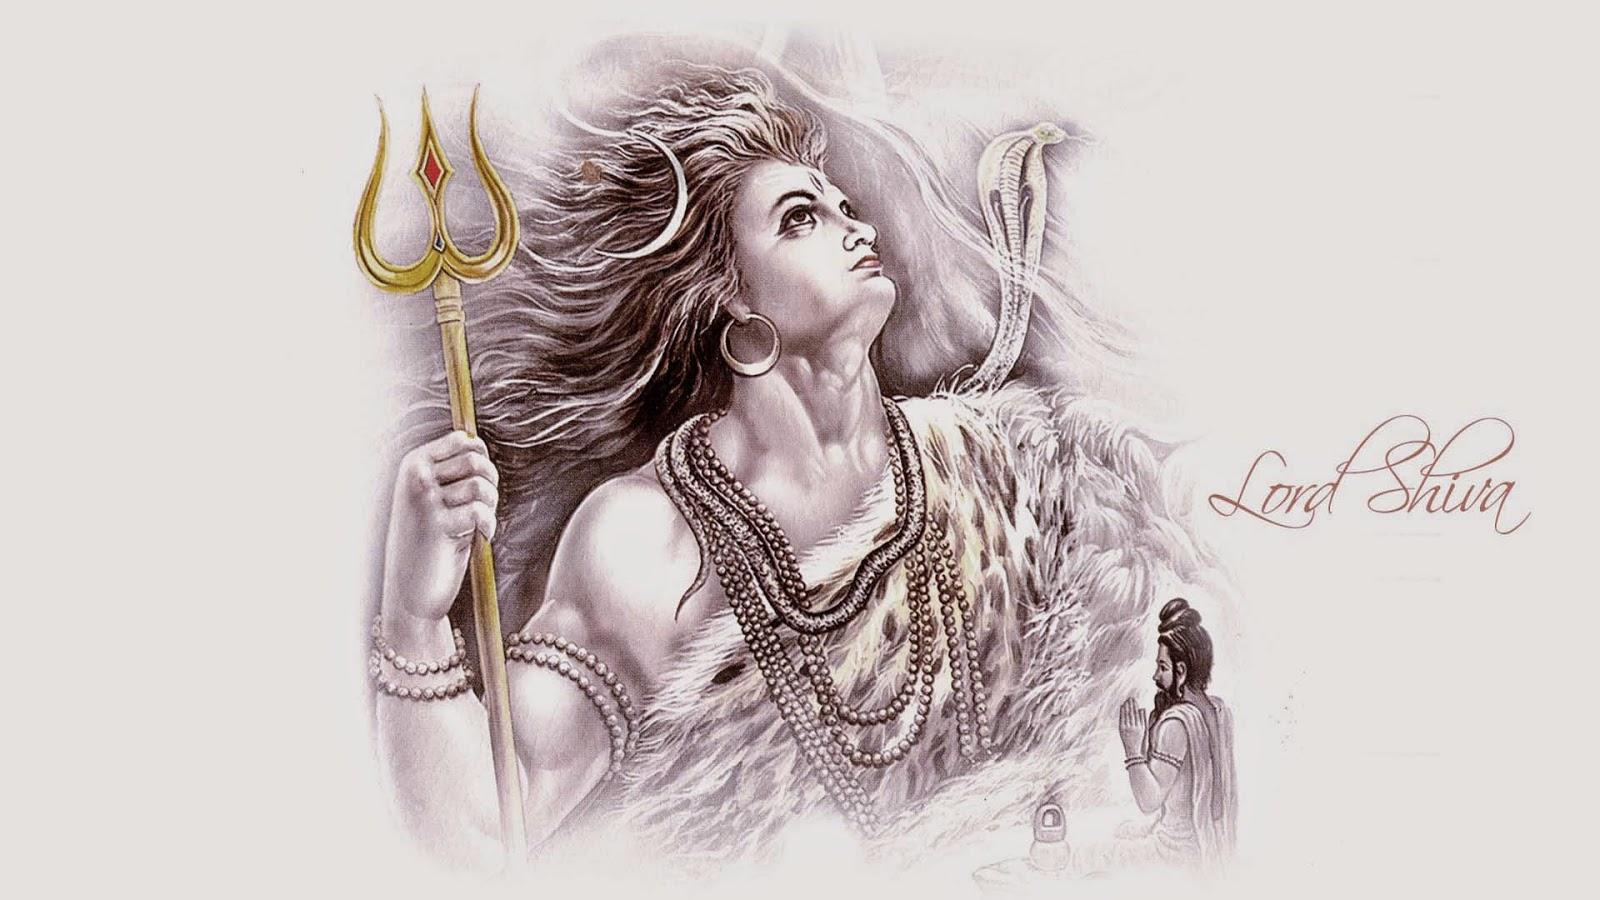 the-Lord-Shiva-Rudra-Avatar-pics